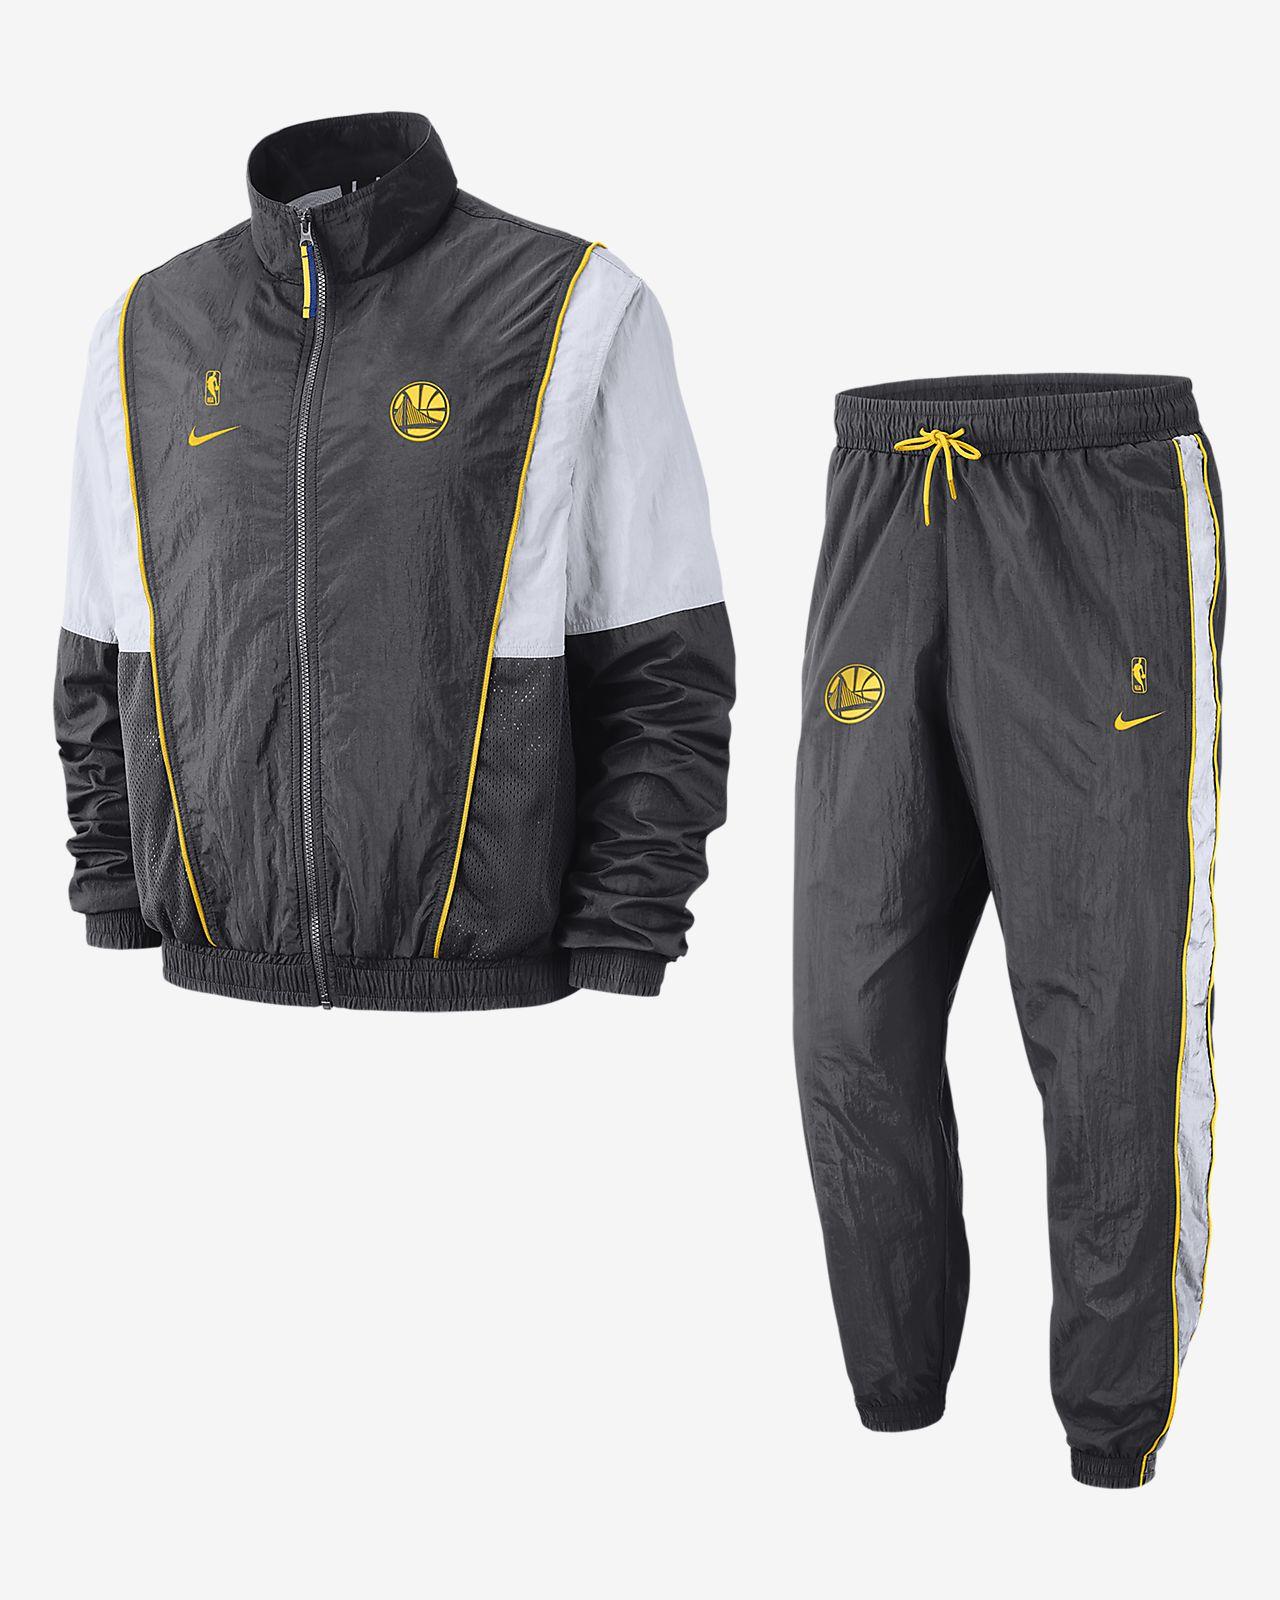 Fato de treino NBA Golden State Warriors Nike para homem